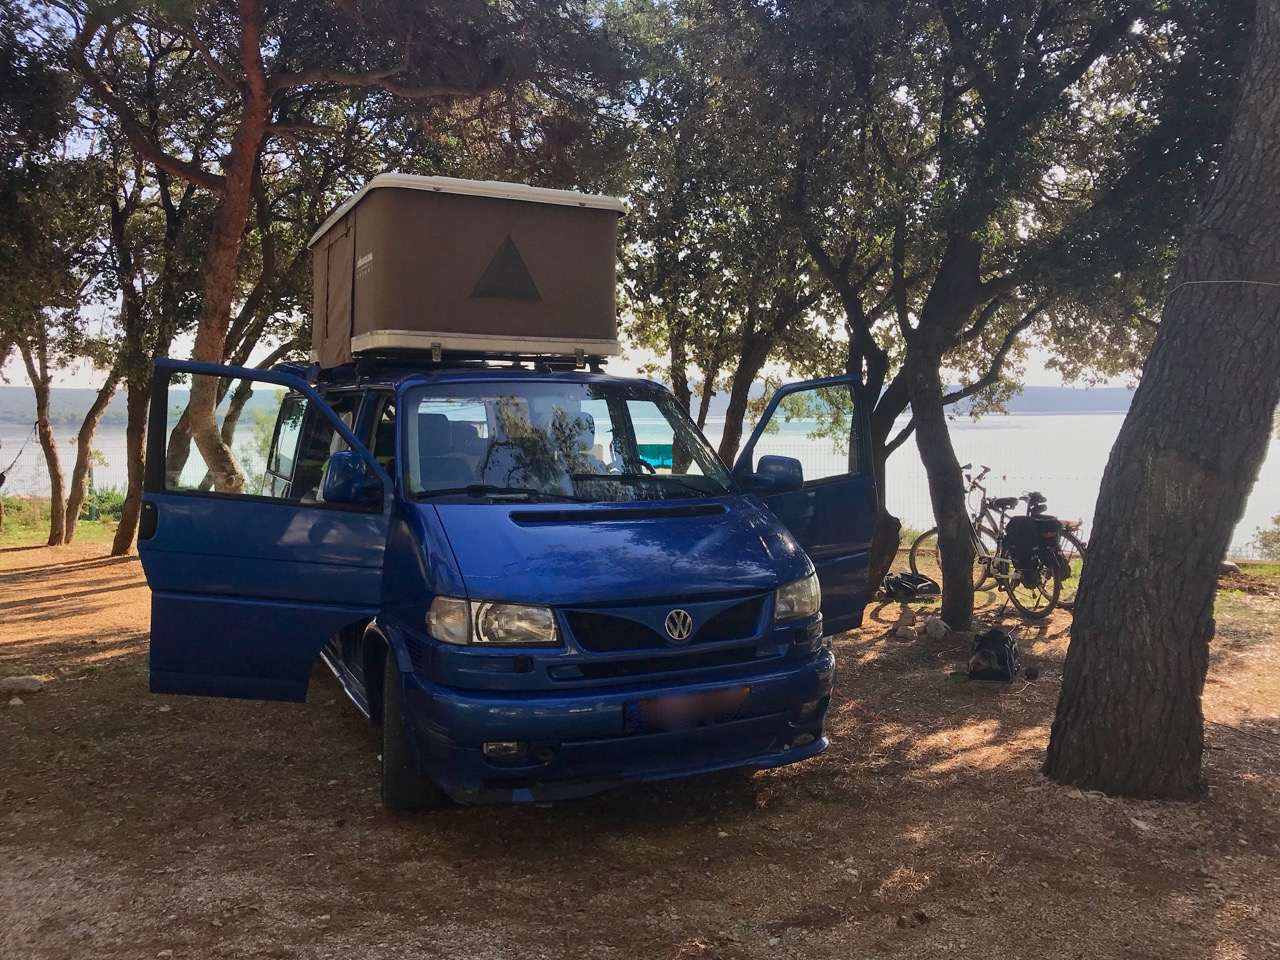 Camping on Losinj